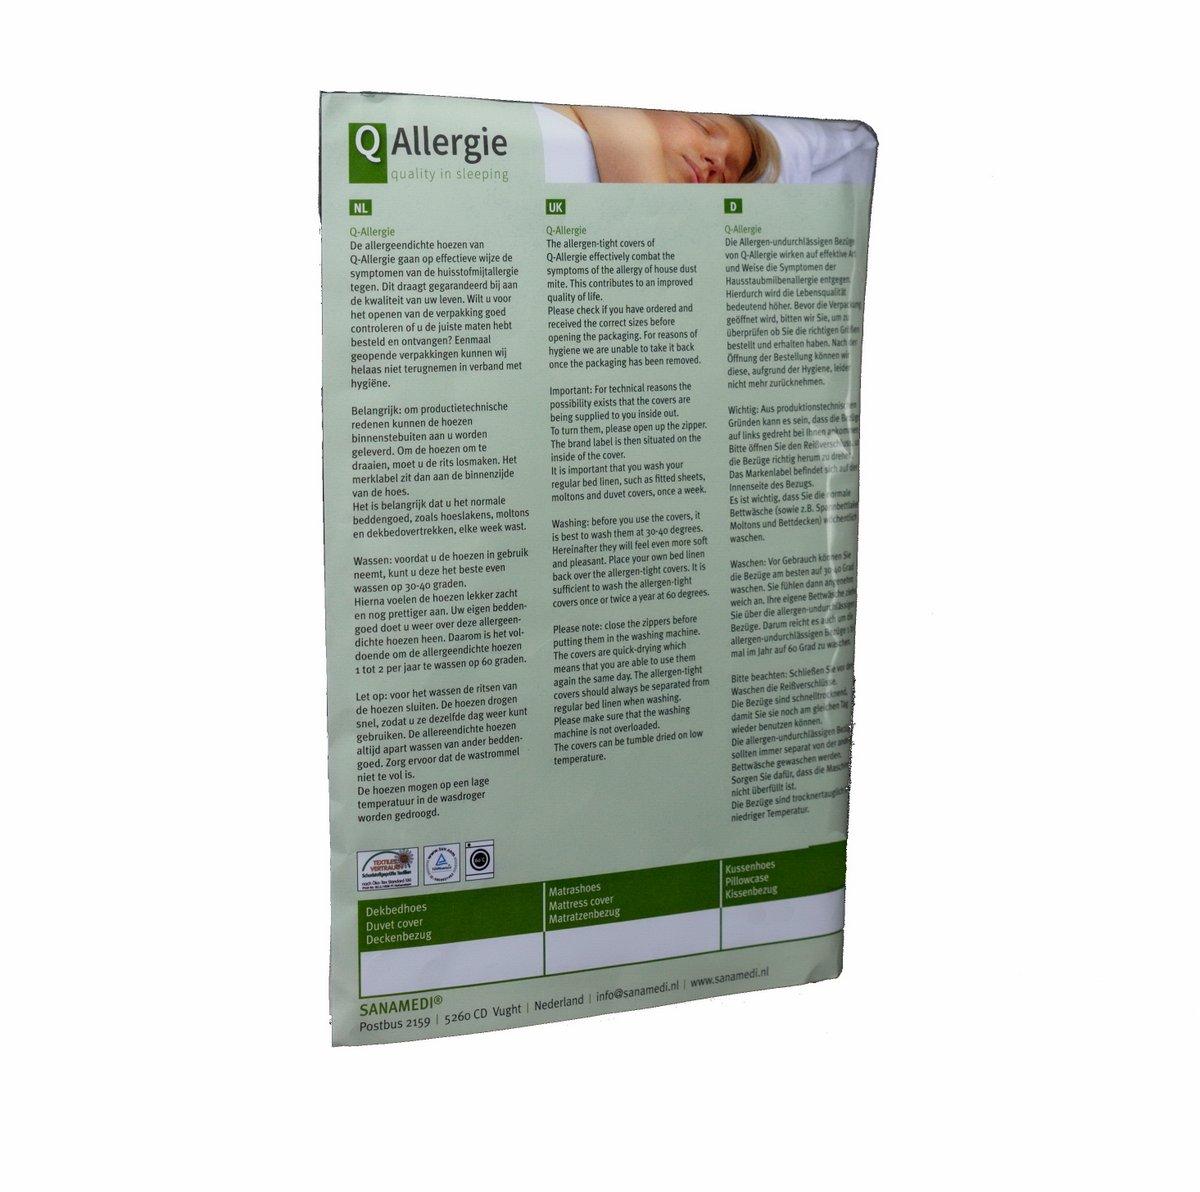 Kussenhoes Q-Allergie 60 x 70 cm